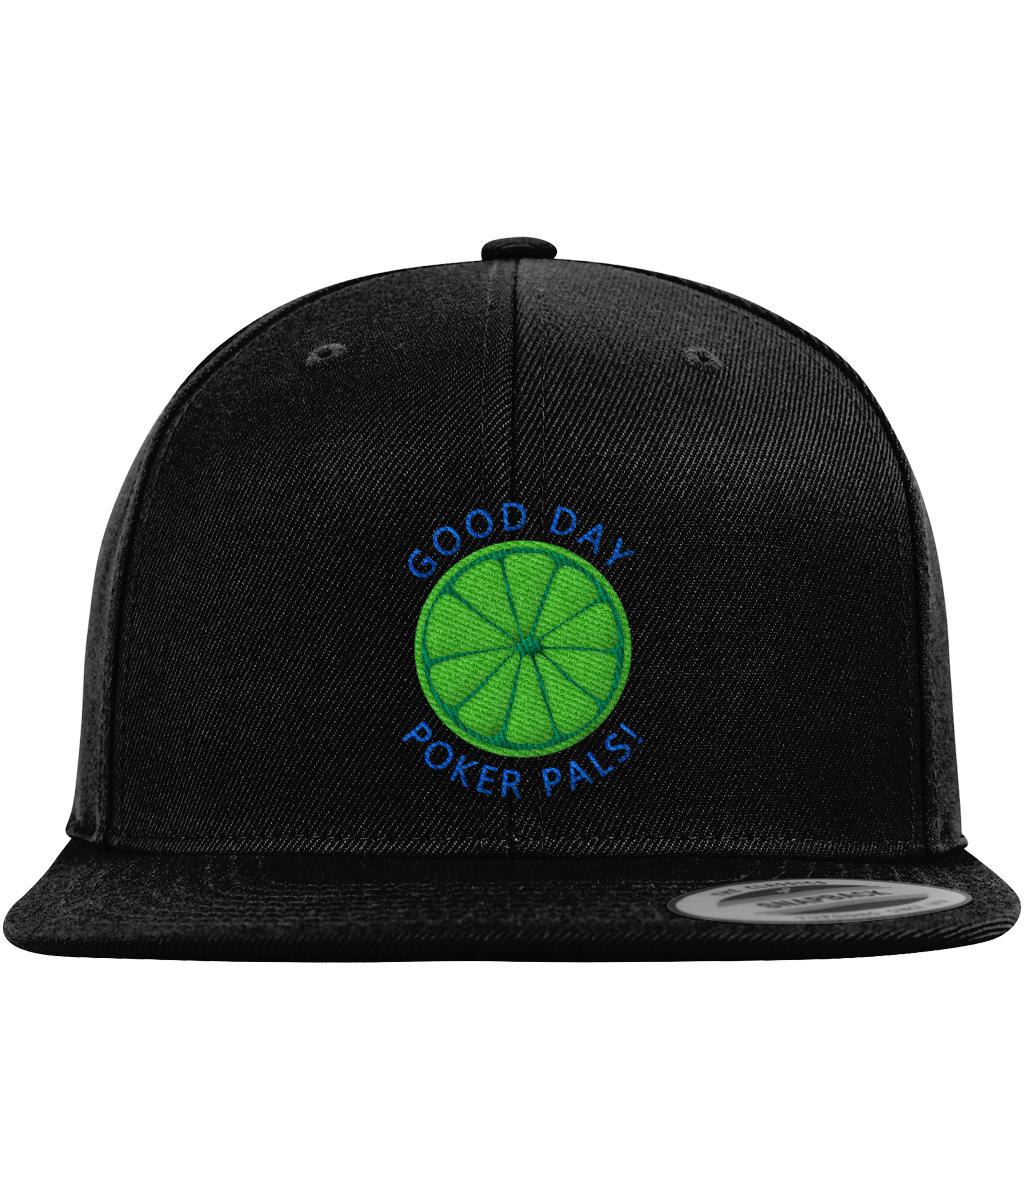 Limerickey Snapback Cap - Black